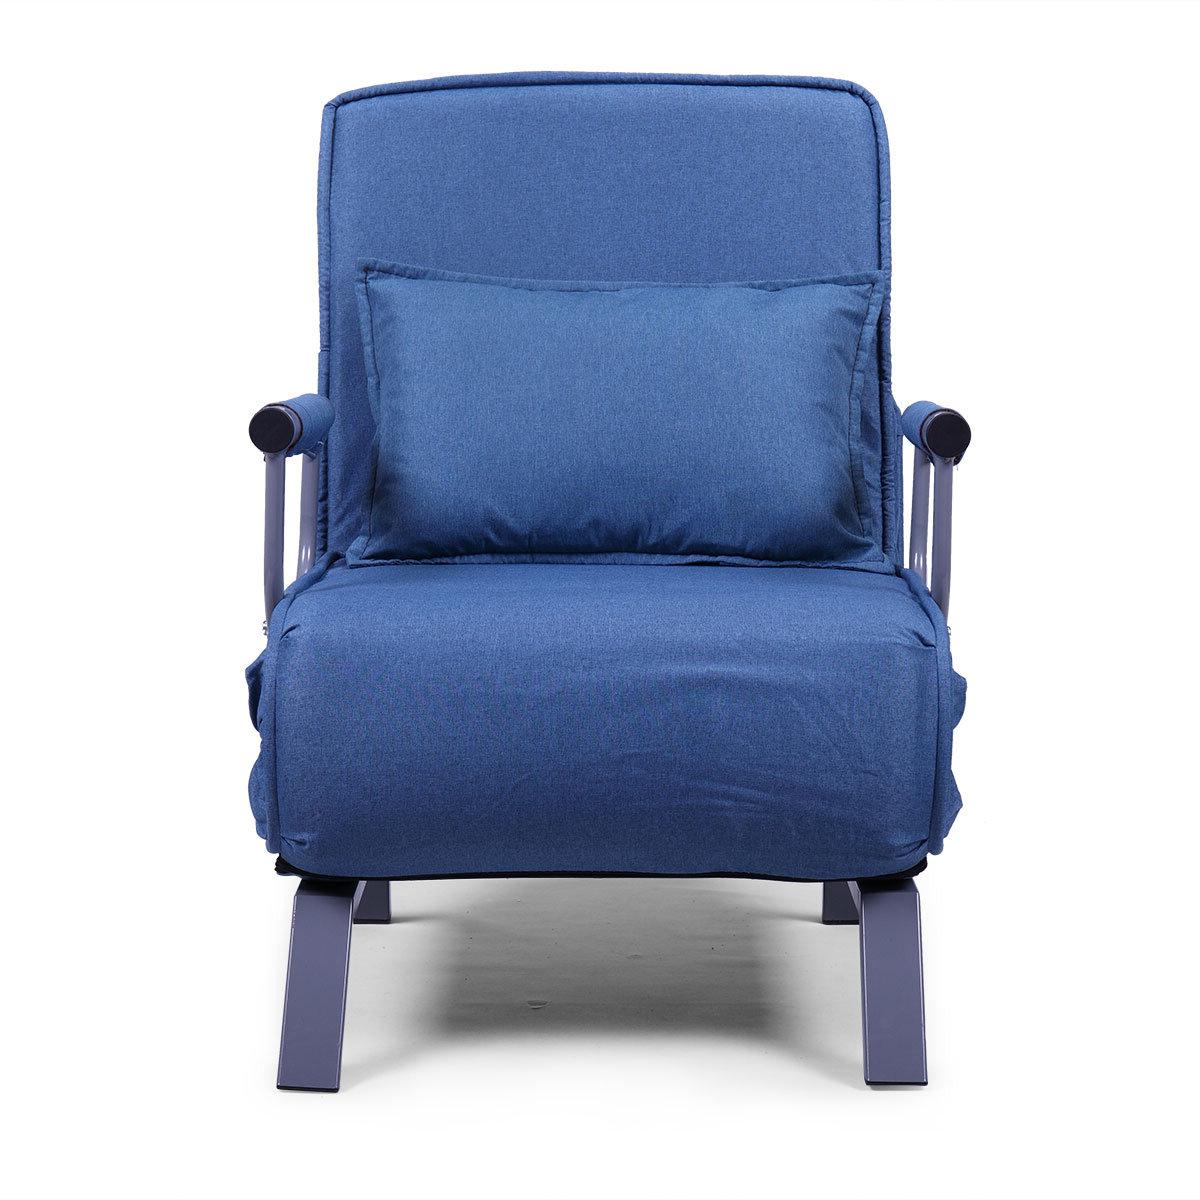 Wayfair With Regard To Bolen Convertible Chairs (View 16 of 20)